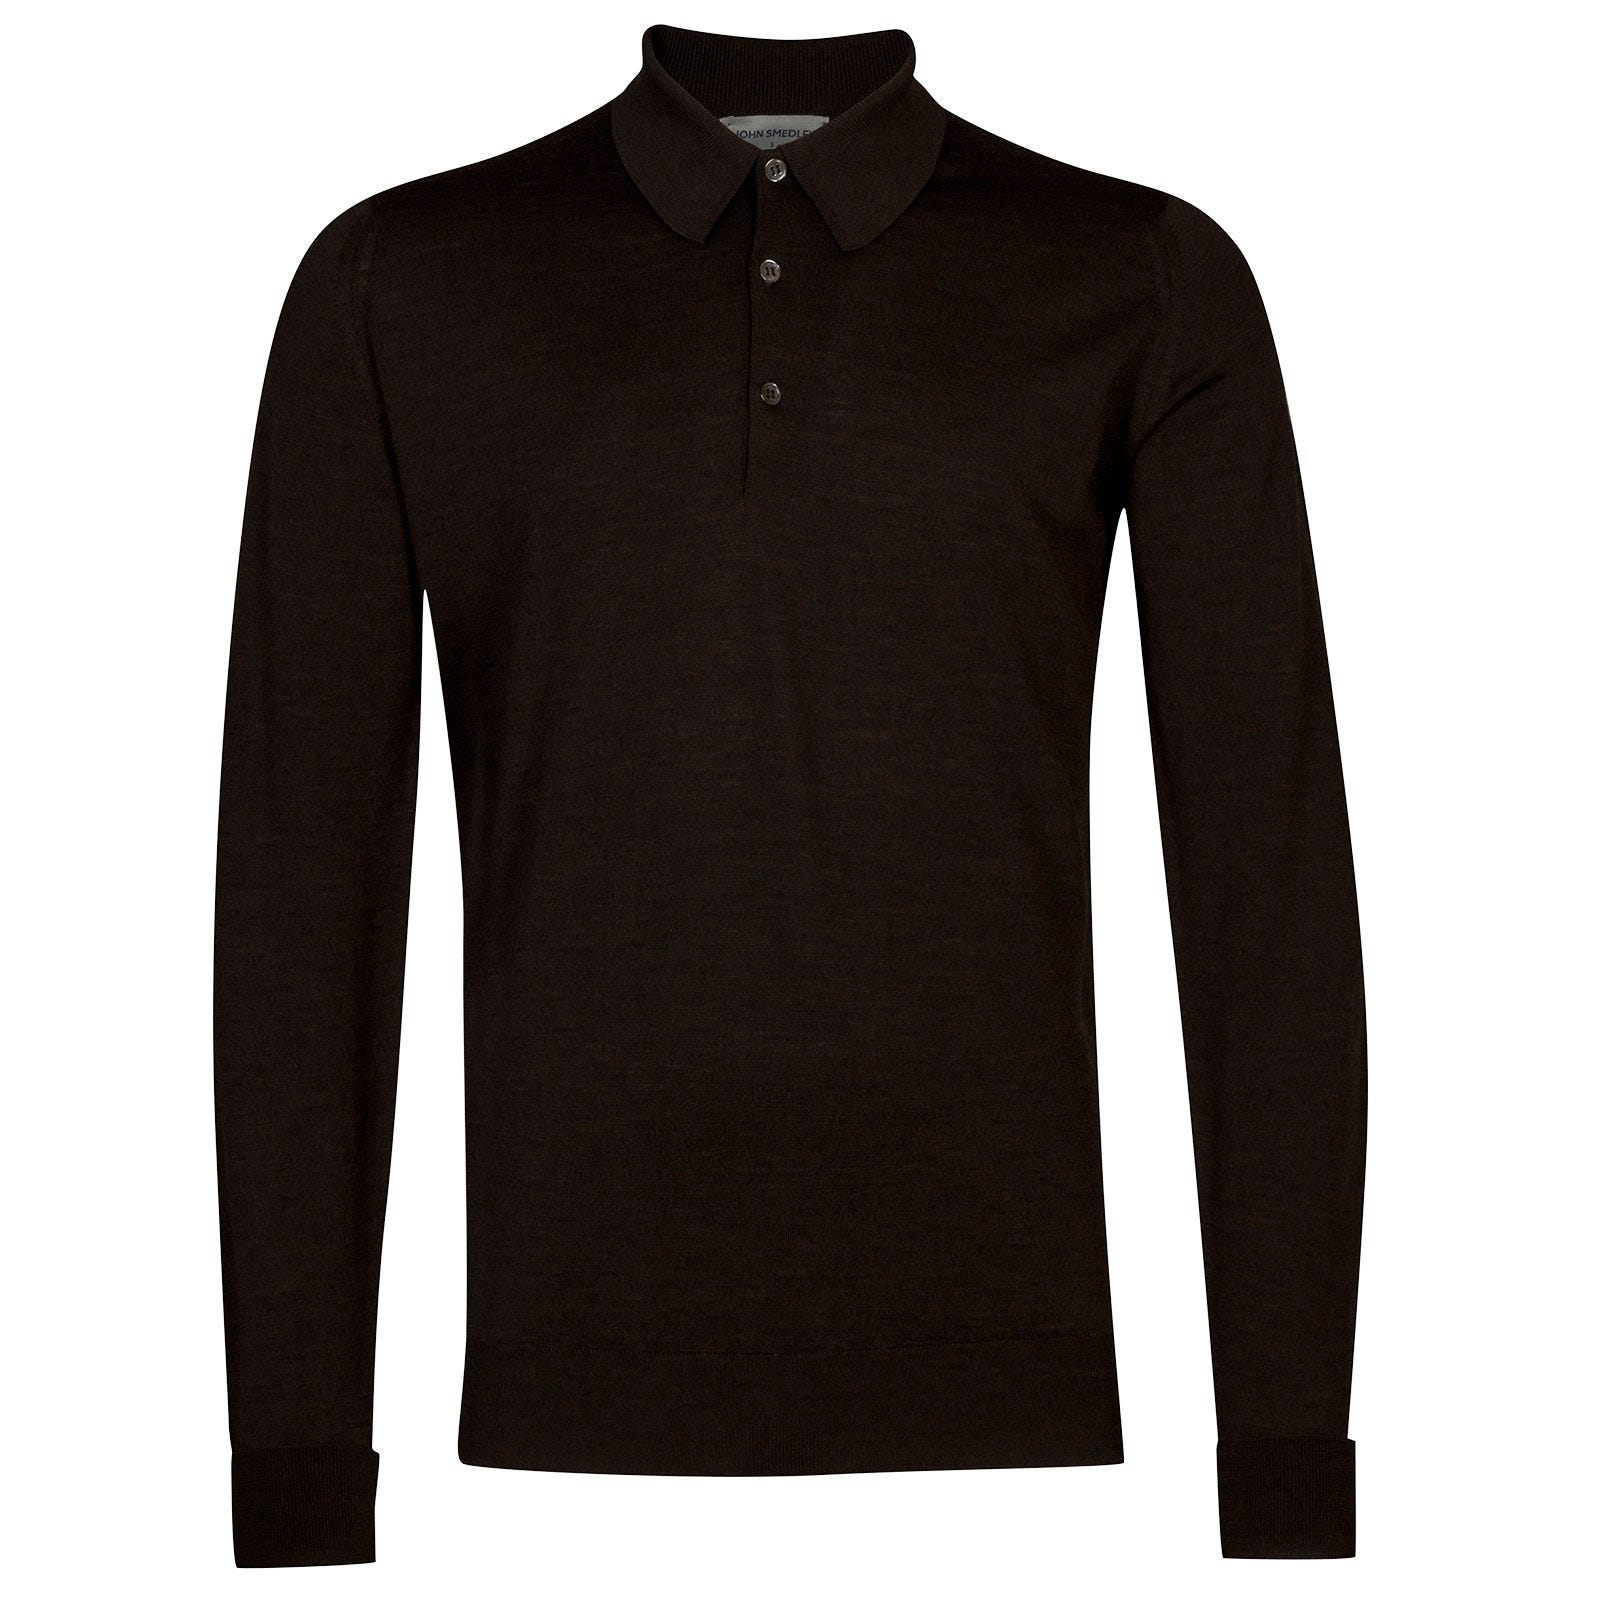 John Smedley Dorset Merino Wool Shirt in Chestnut-XXL